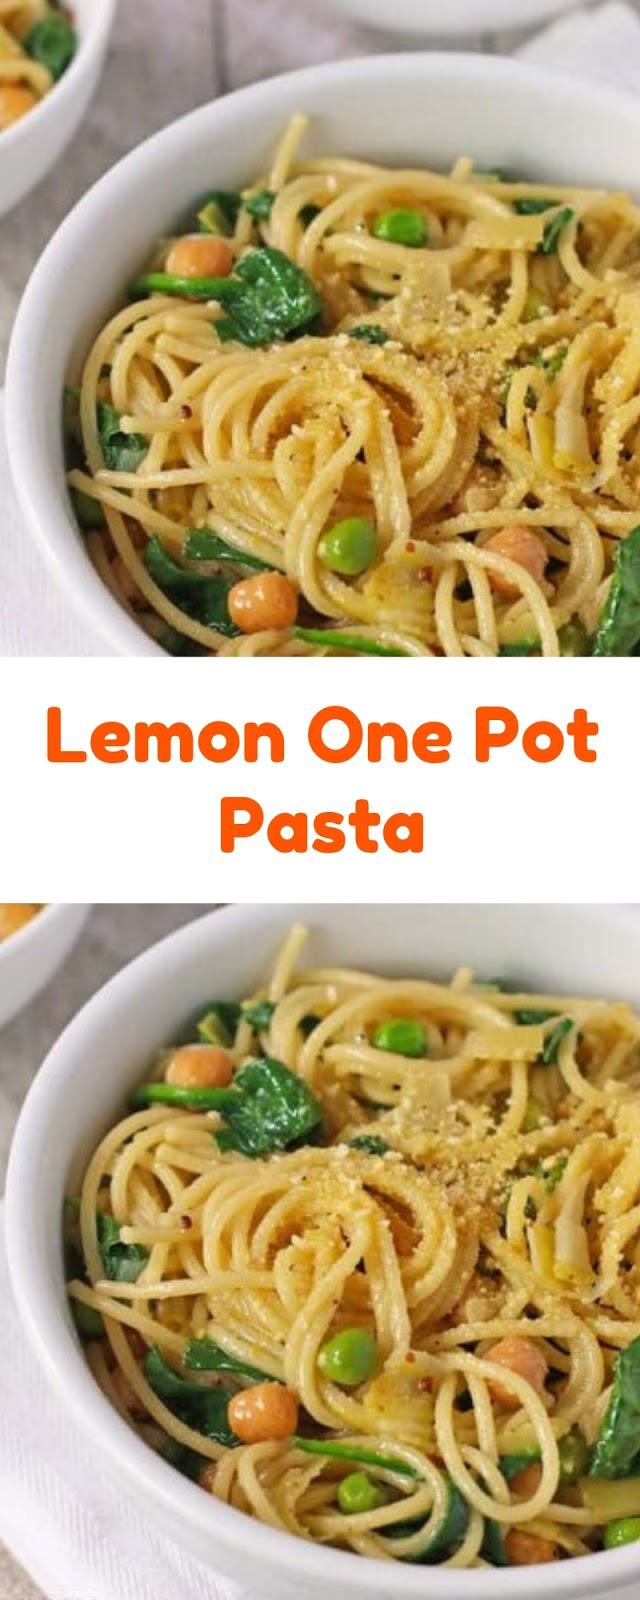 The Best Lemon One Pot Pasta Recipe